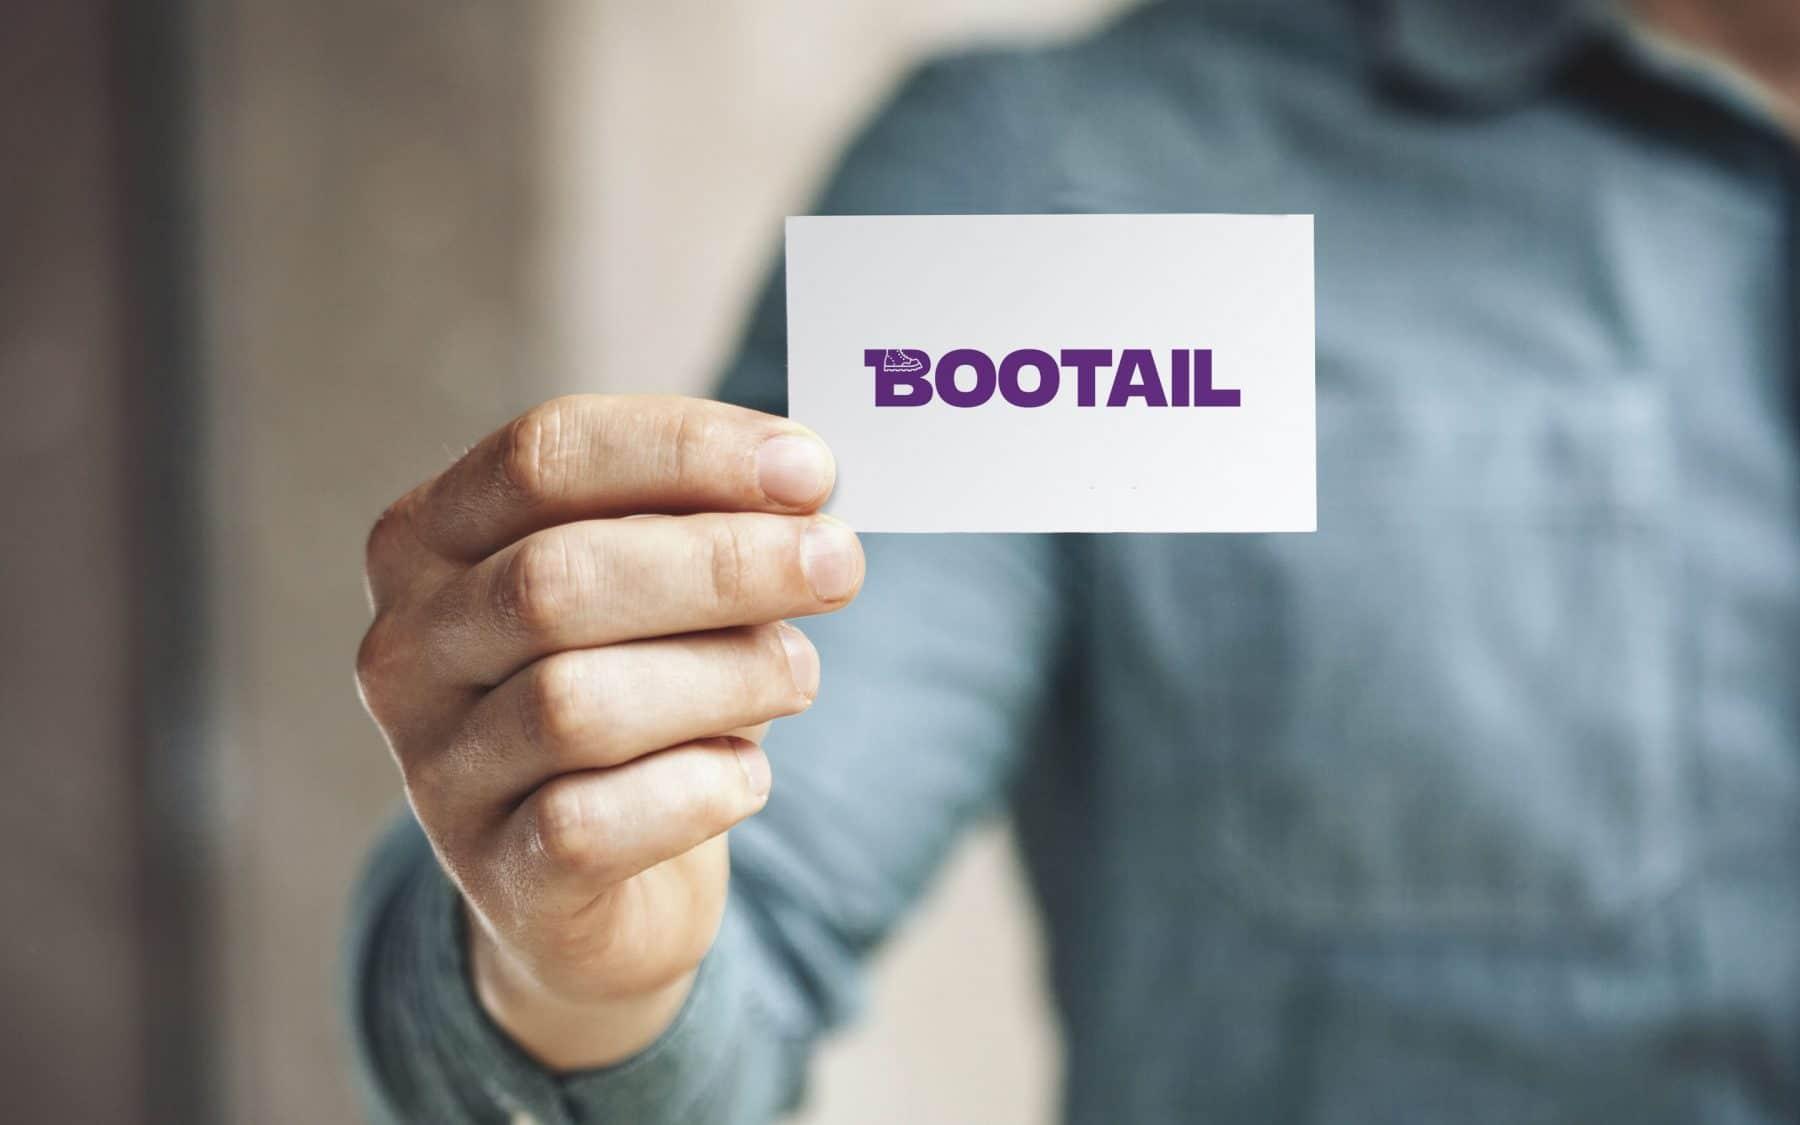 Bootail 1